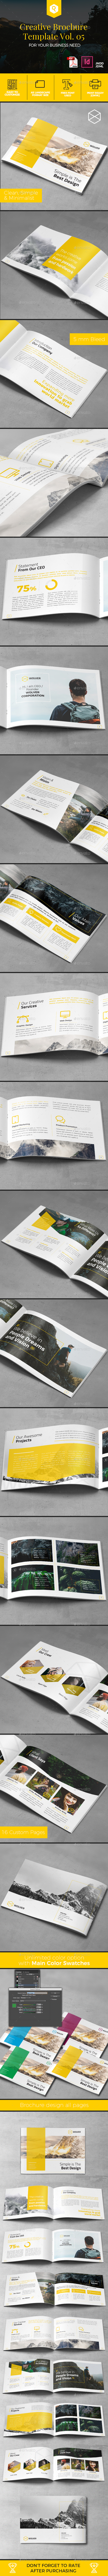 A5 Creative Brochure Template Vol. 05 - Corporate Brochures